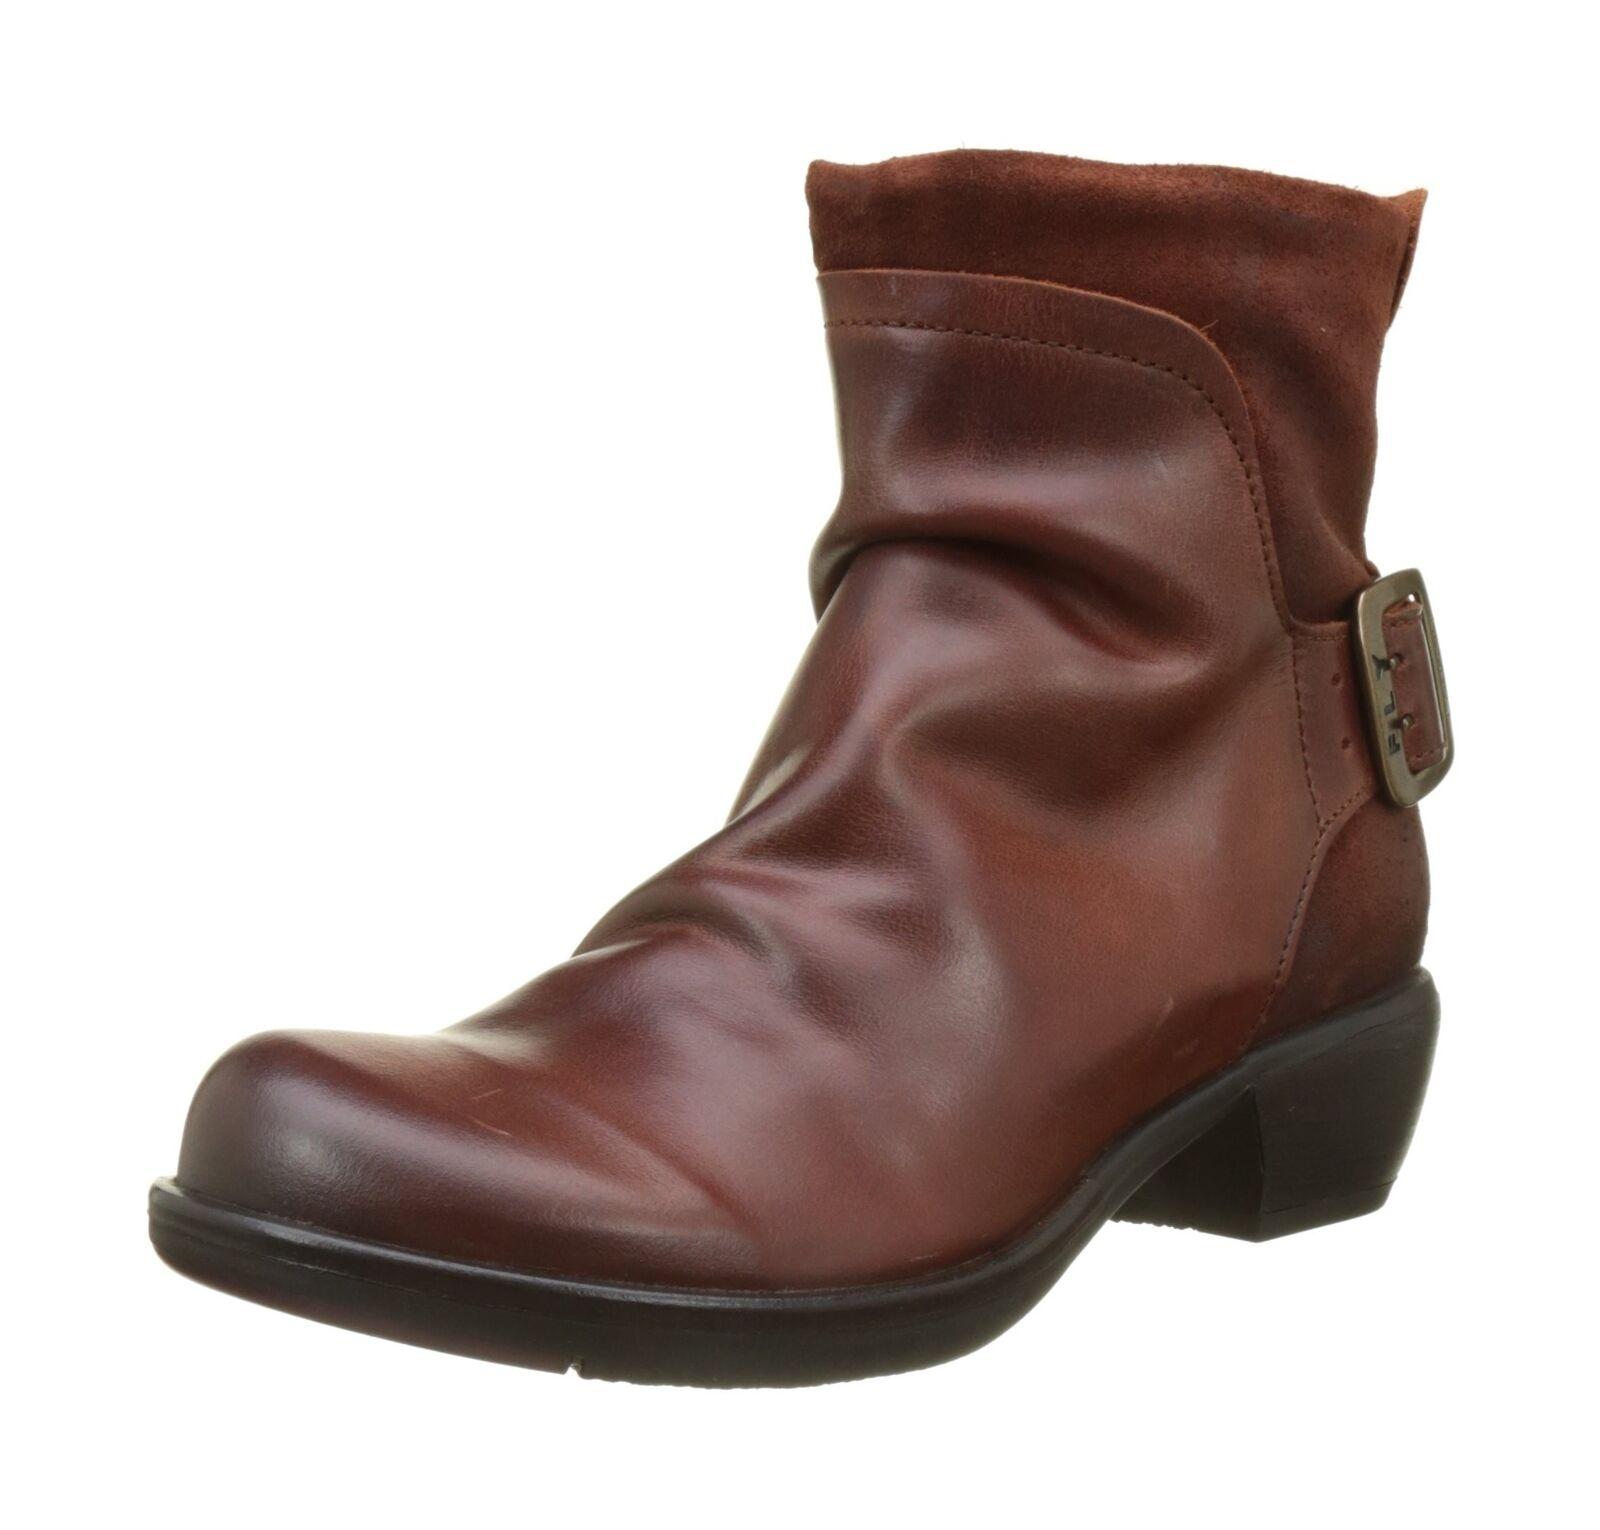 690f42d00df93 Fly London Mel Women's Ankle Boots. for sale online   eBay